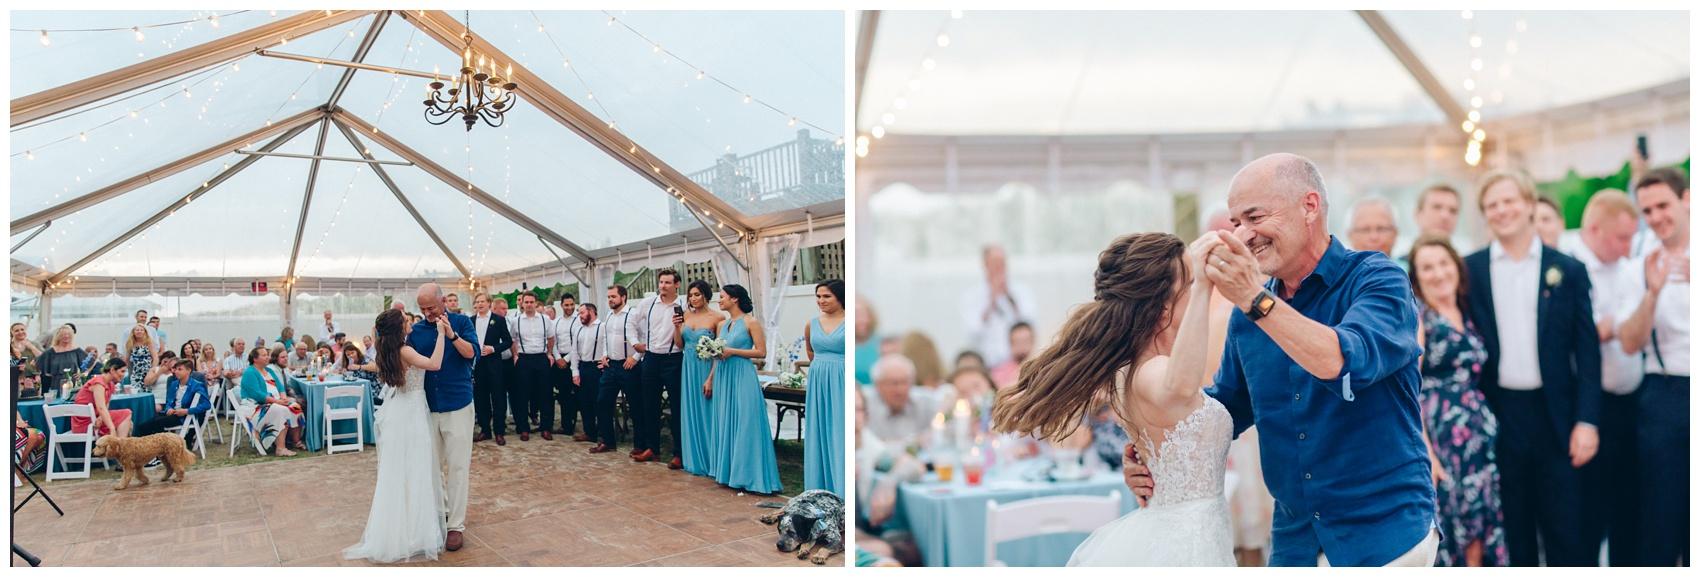 Outer-Banks-Corolla-Wedding_0107.jpg